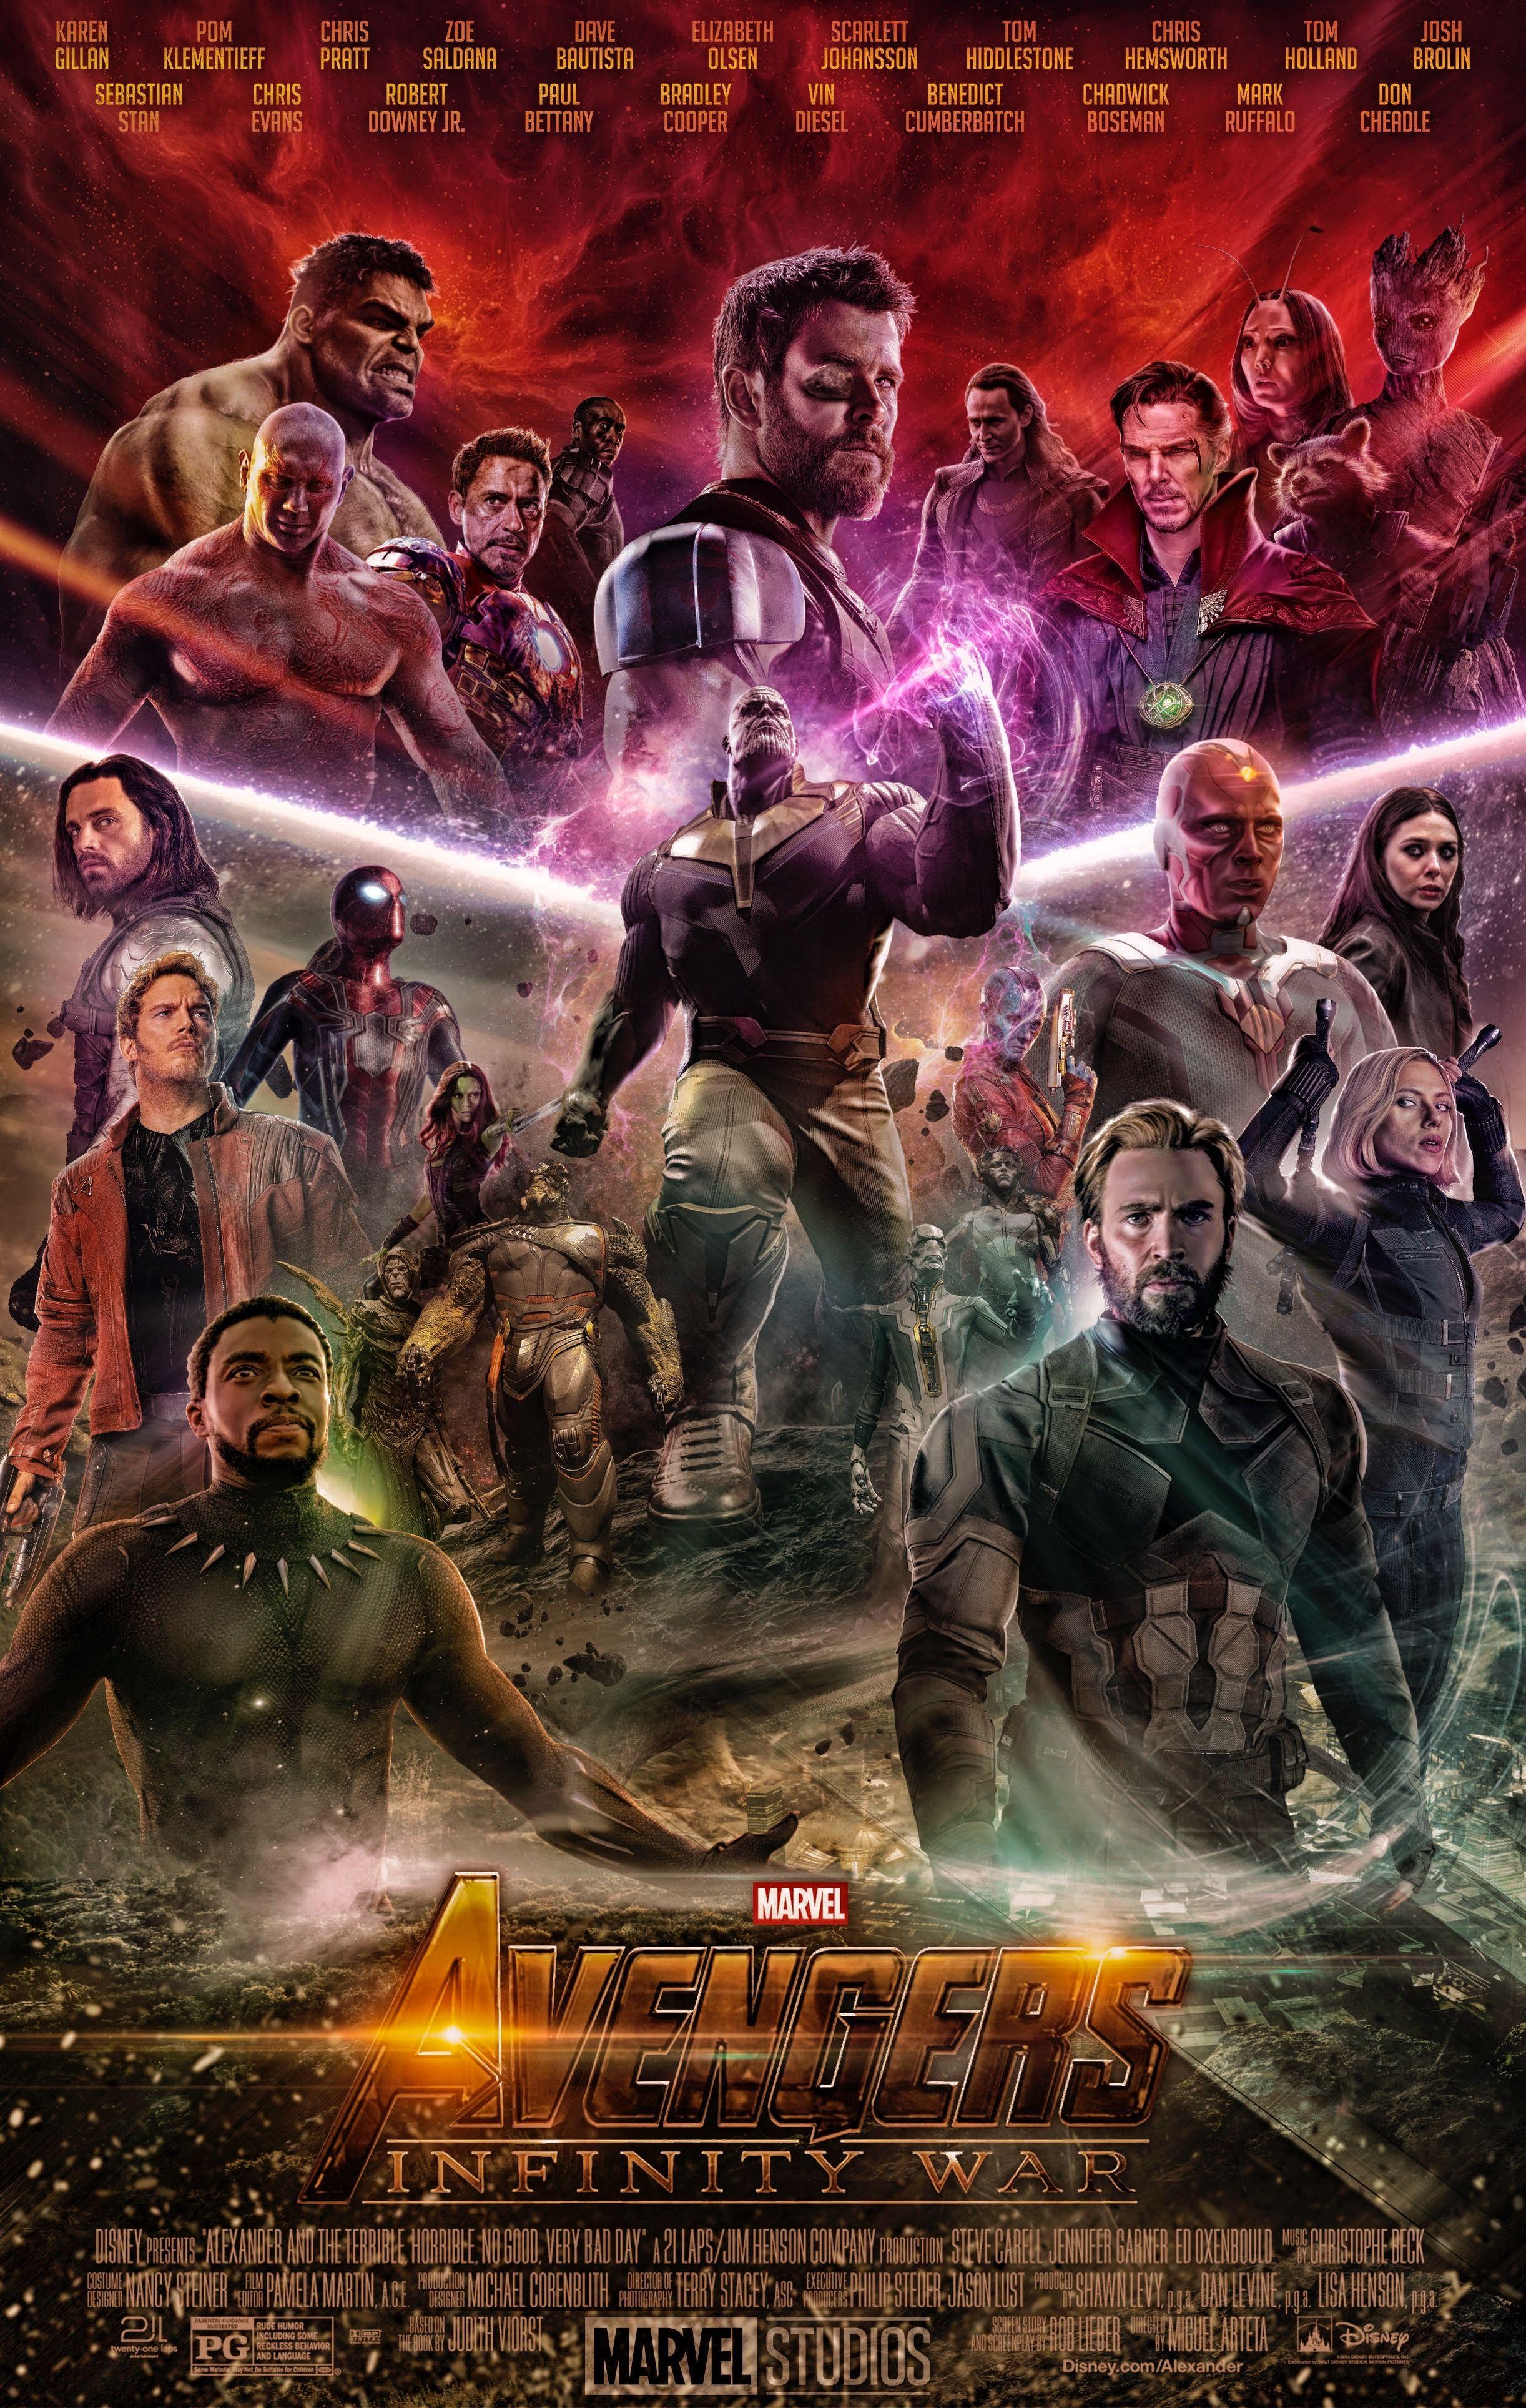 Avengers Infinity War Poster 2018 Marvel superheroes